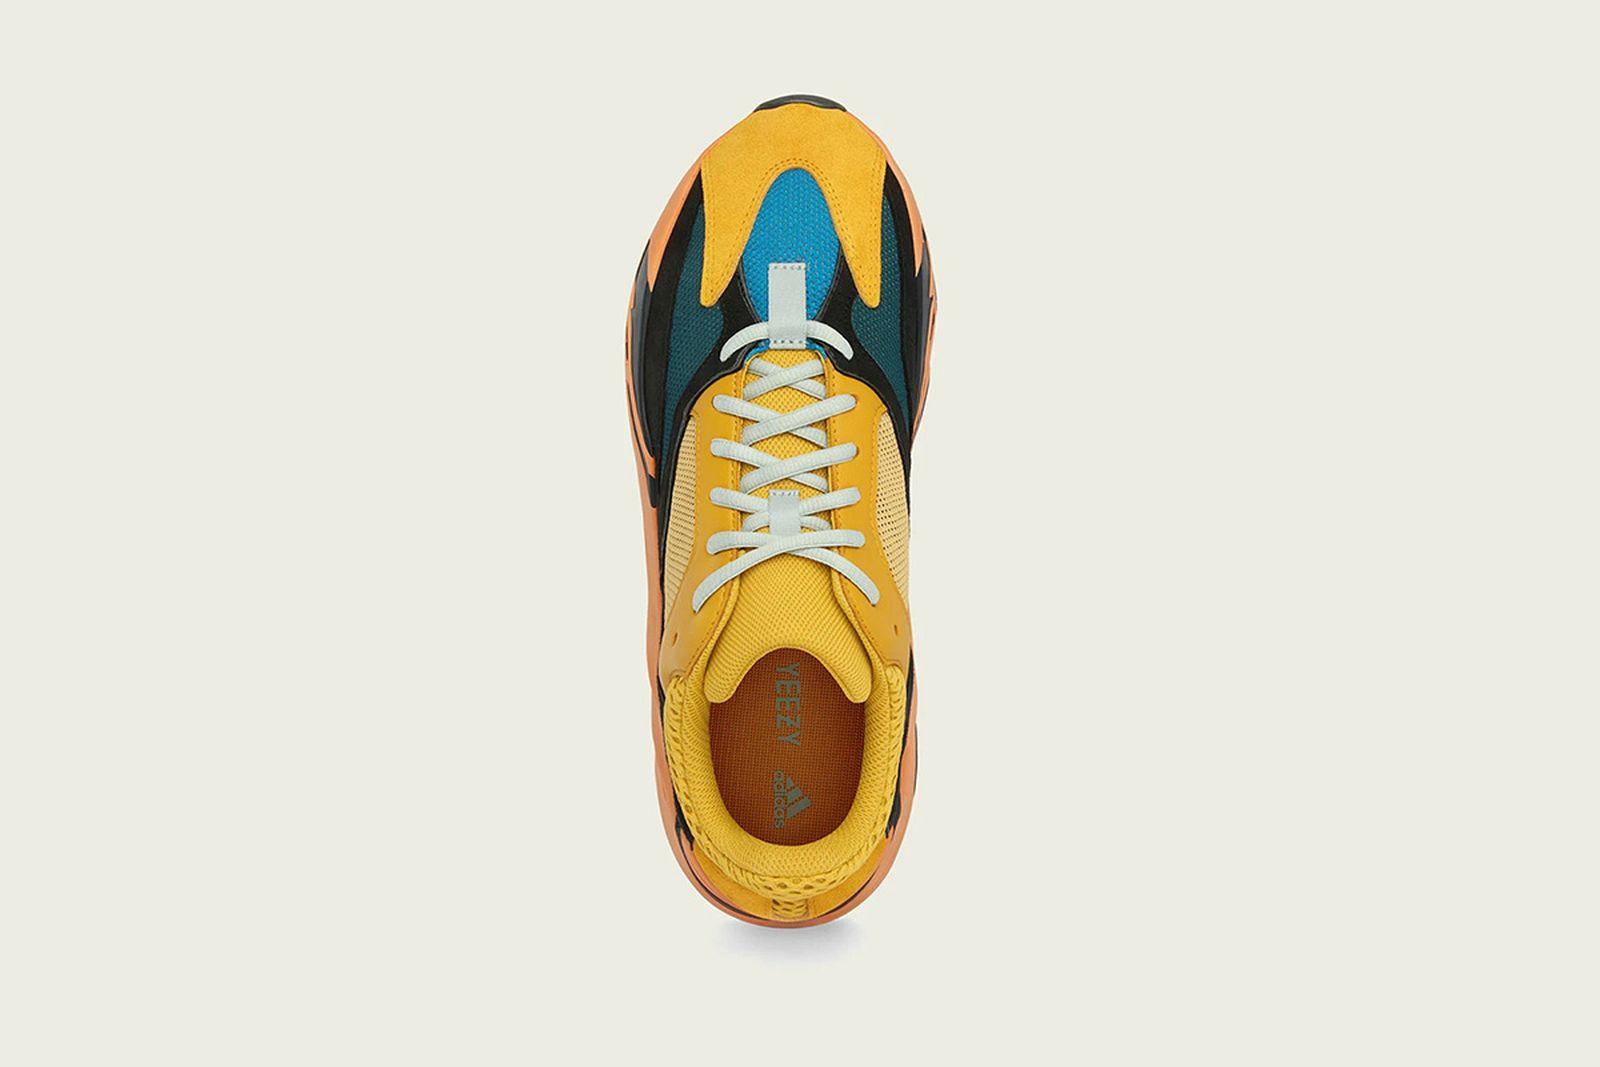 adidas-yeezy-boost-700-sun-release-date-price-02